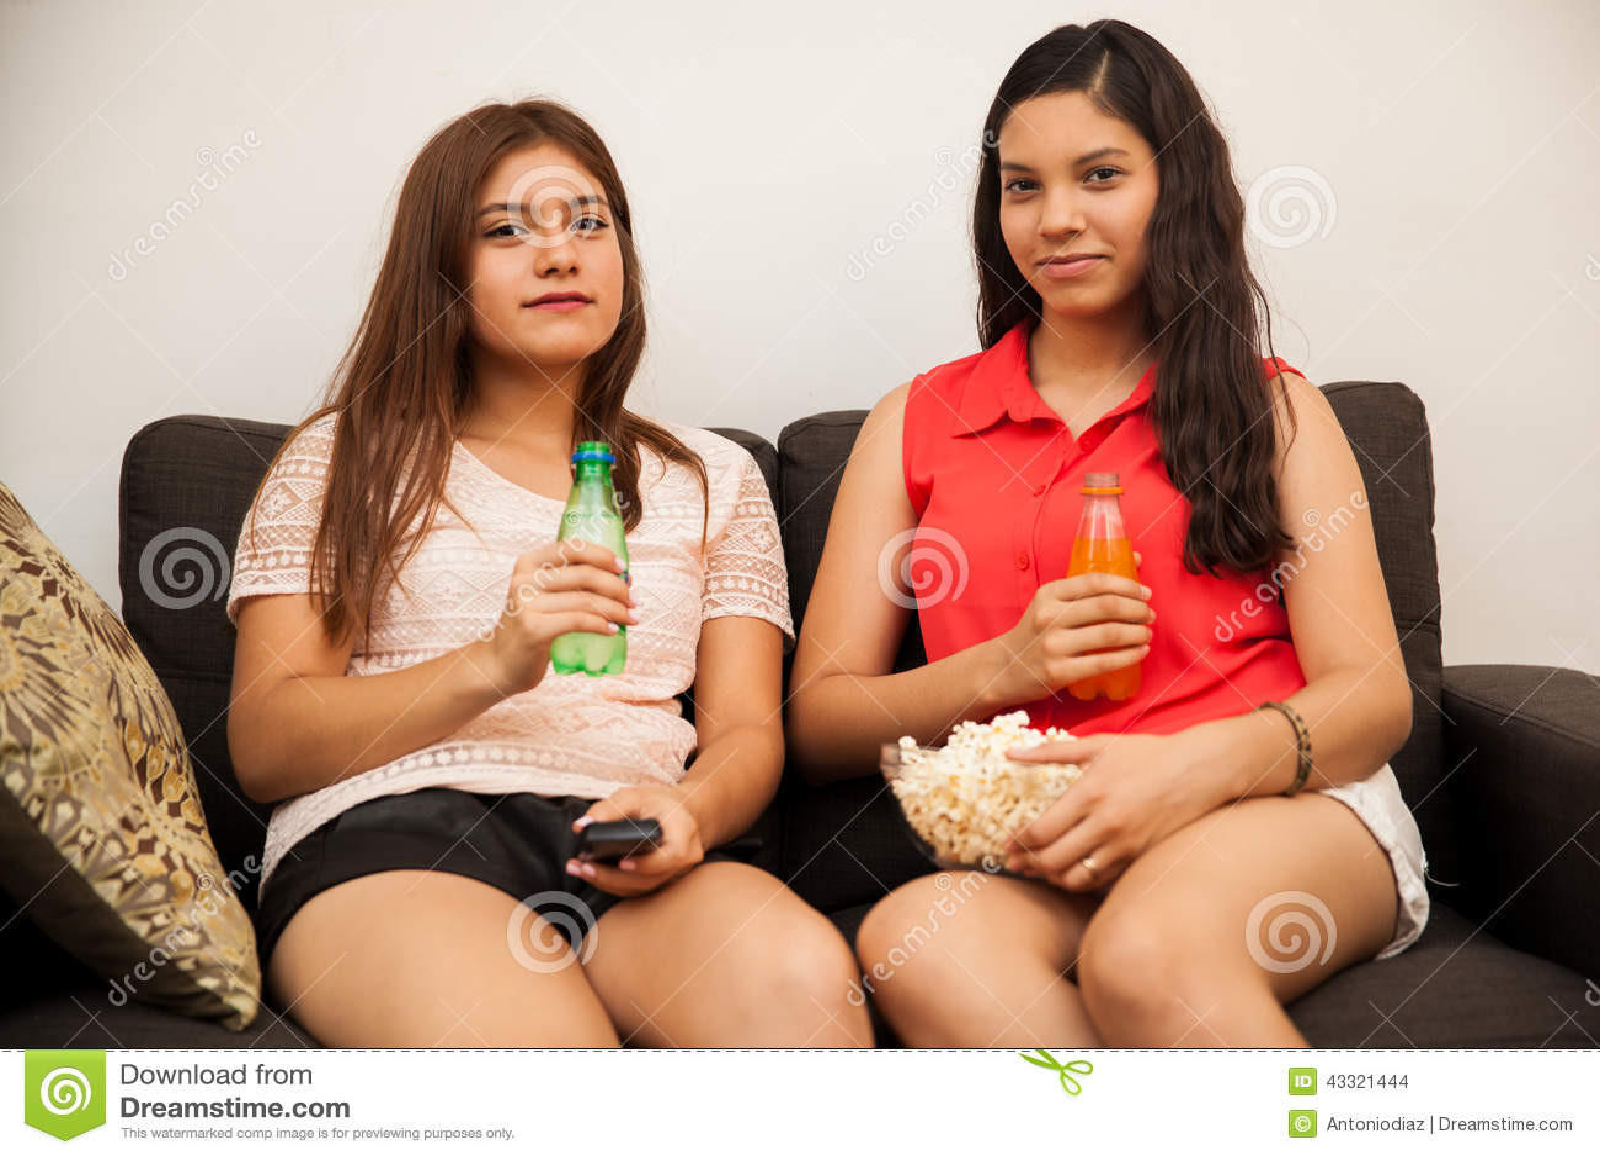 Best selling teen, animated fat women porn